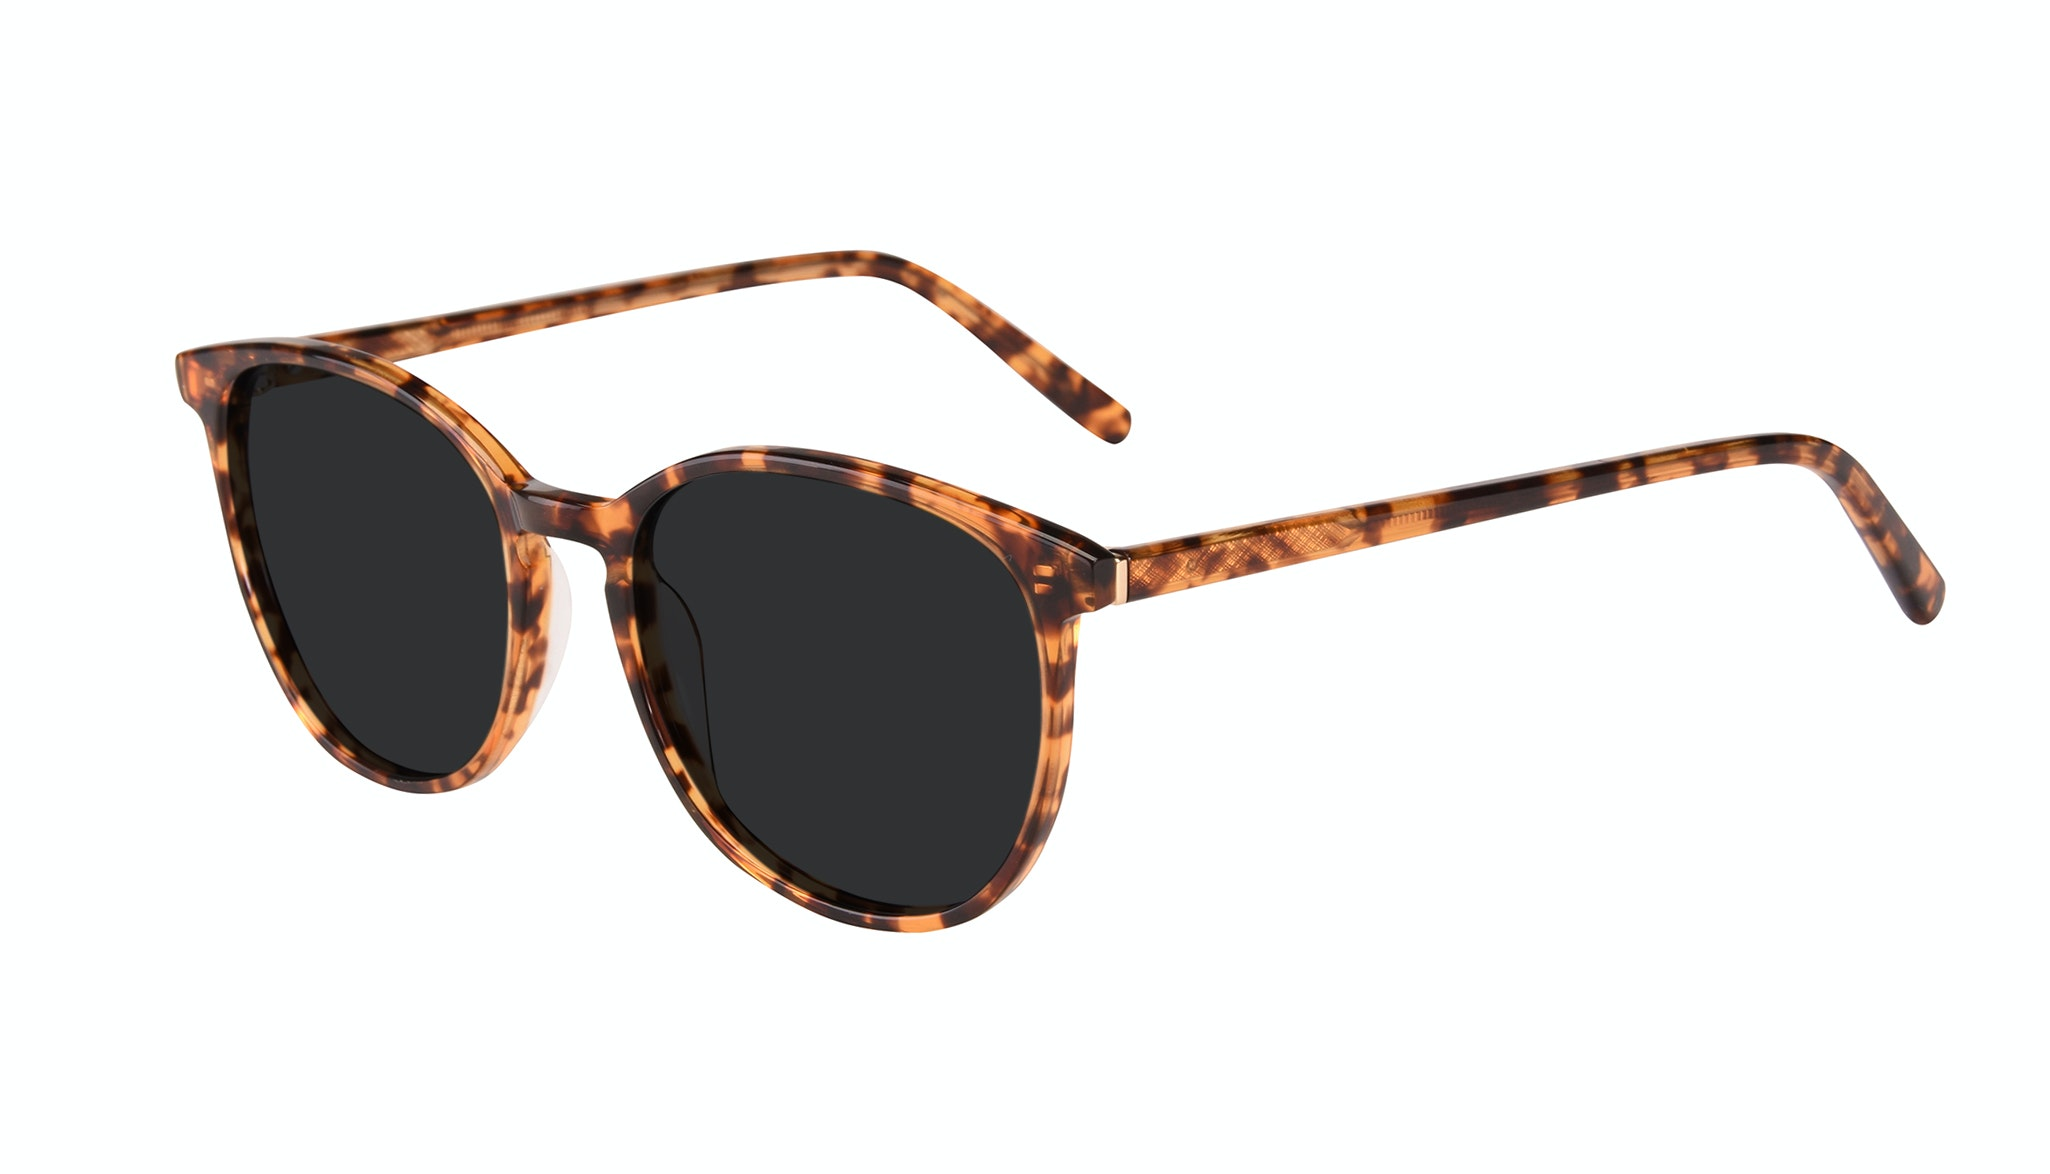 Affordable Fashion Glasses Round Sunglasses Women Femme Libre Josette Tilt